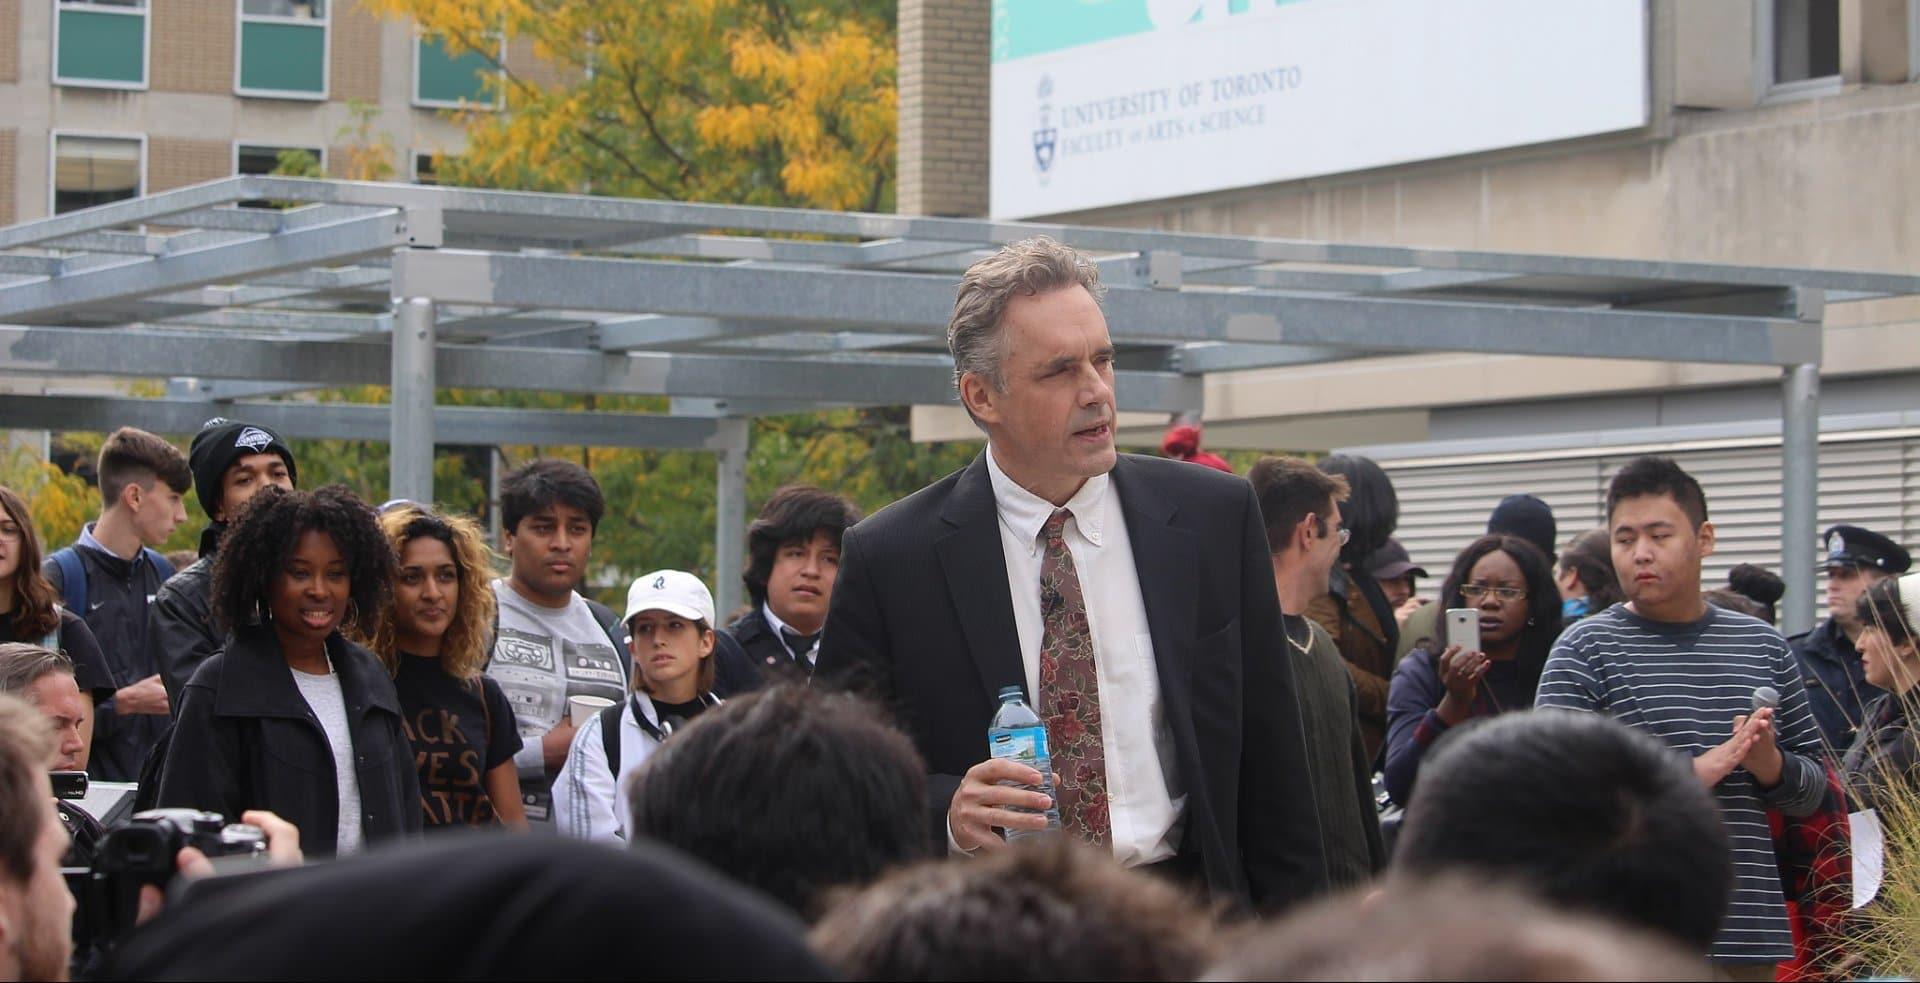 Jordan B. Peterson an der Universität von Toronto – Bild: Quist [CC BY-SA 4.0 (https://creativecommons.org/licenses/by-sa/4.0)]